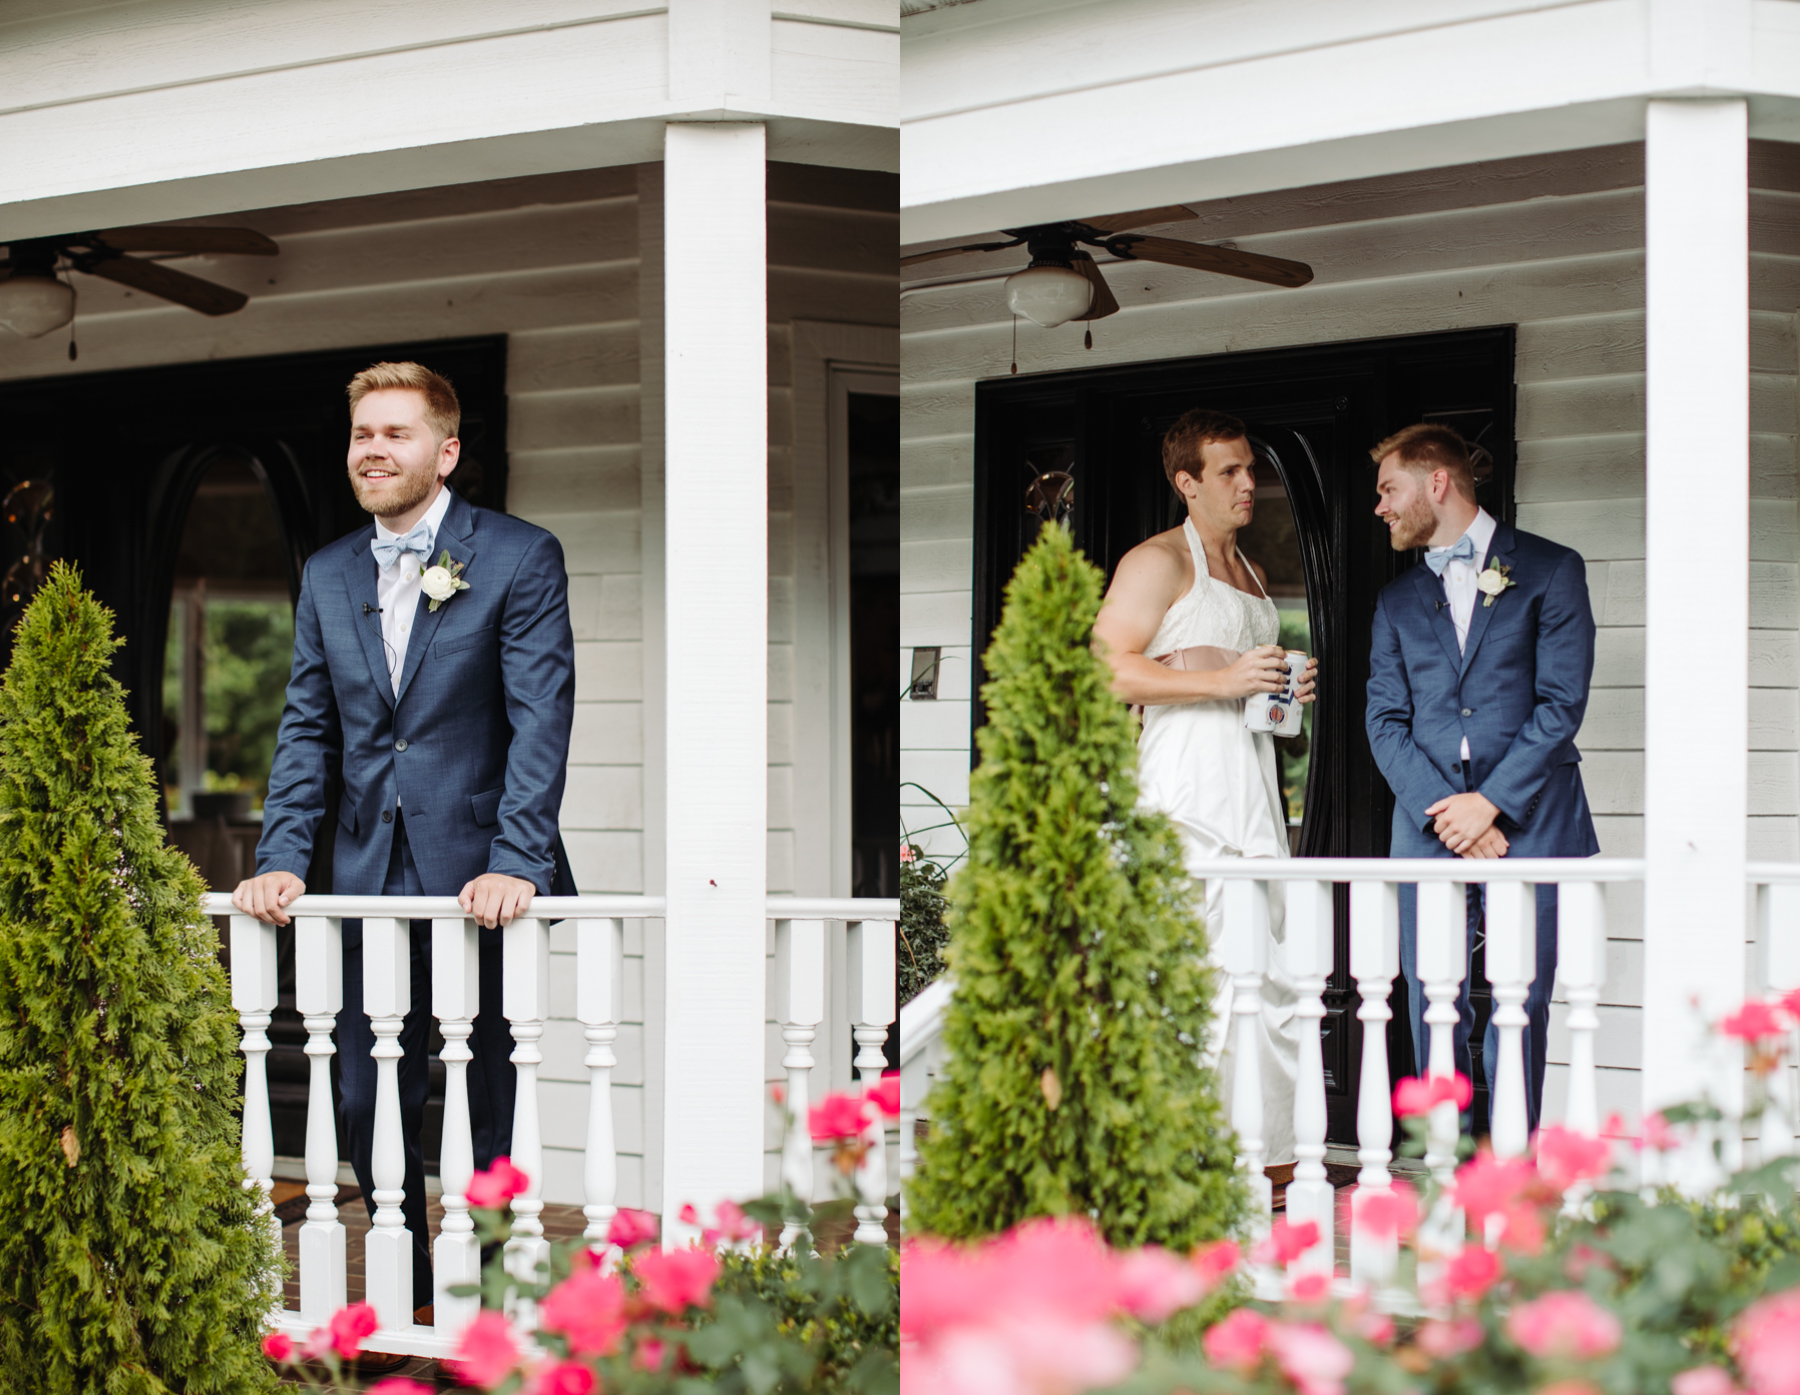 daras-garden-wedding-6.jpg